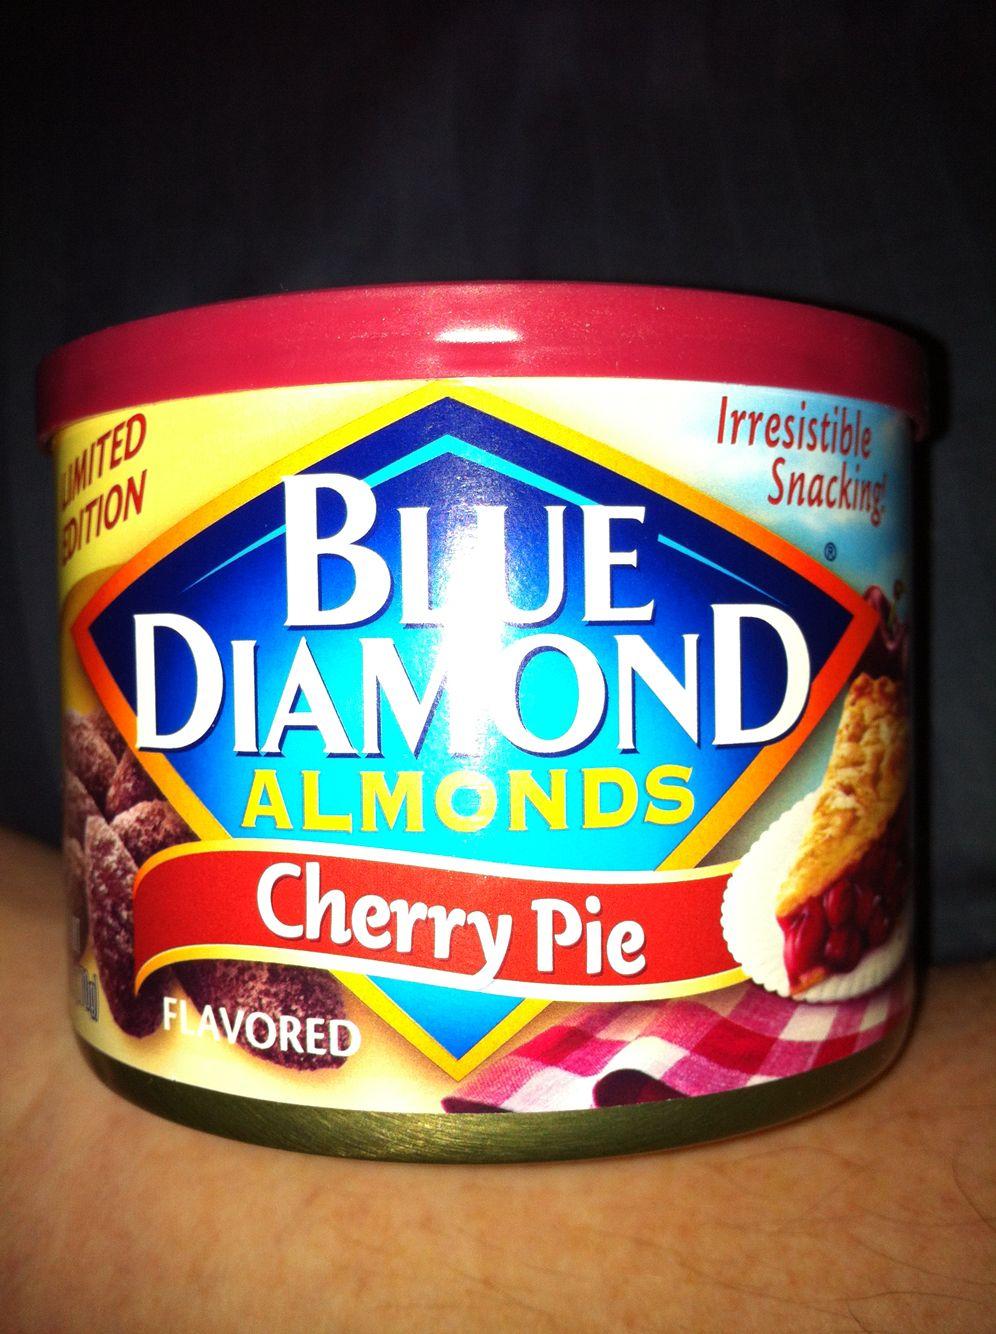 Blue diamond almonds cherry pie flavor